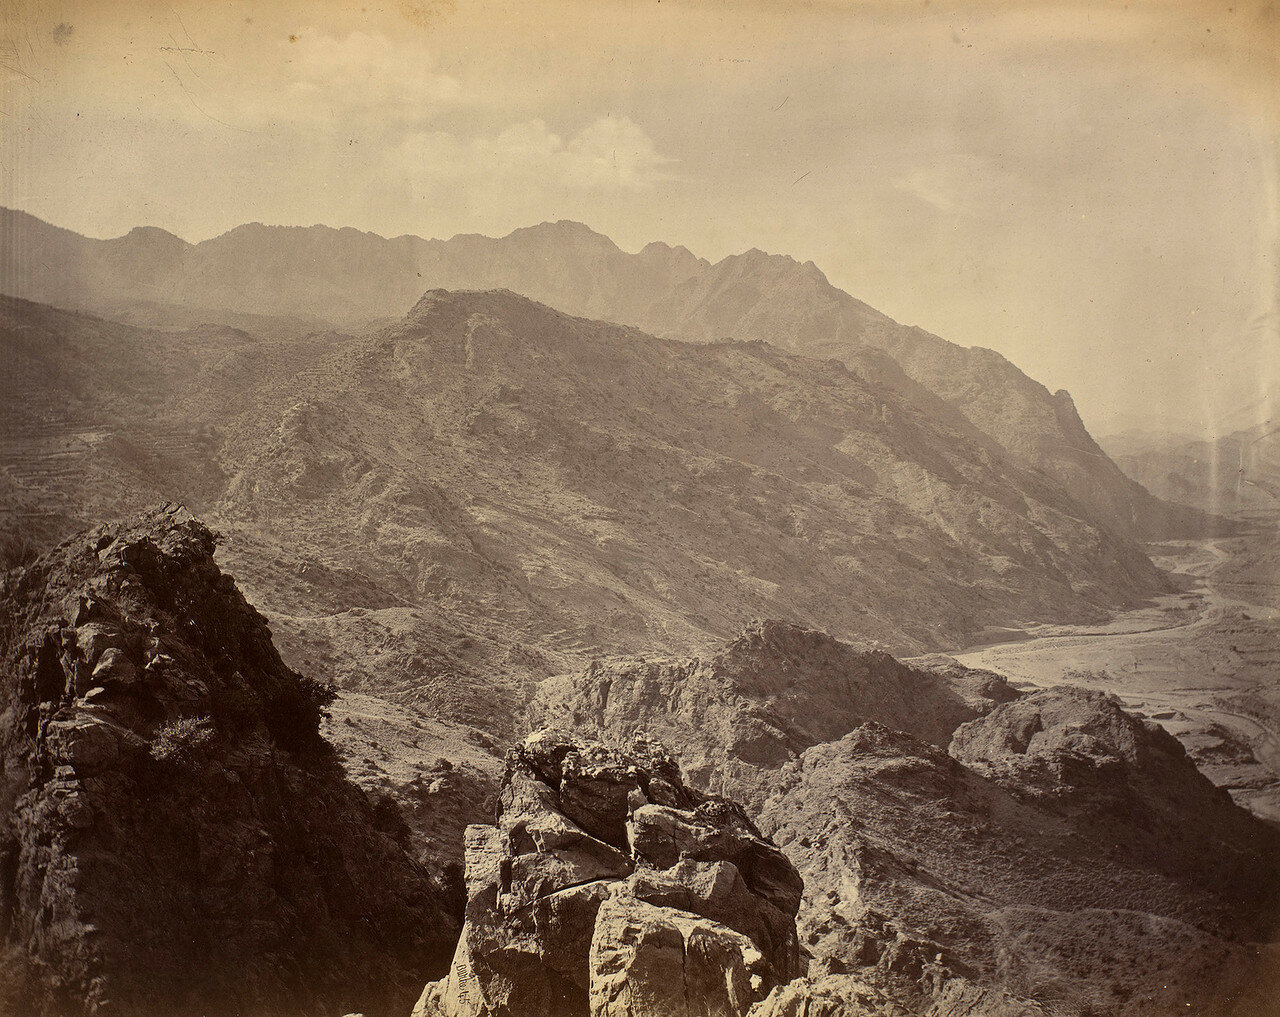 38. Вид из Ланди-Котала  в сторону Ланди-Хана